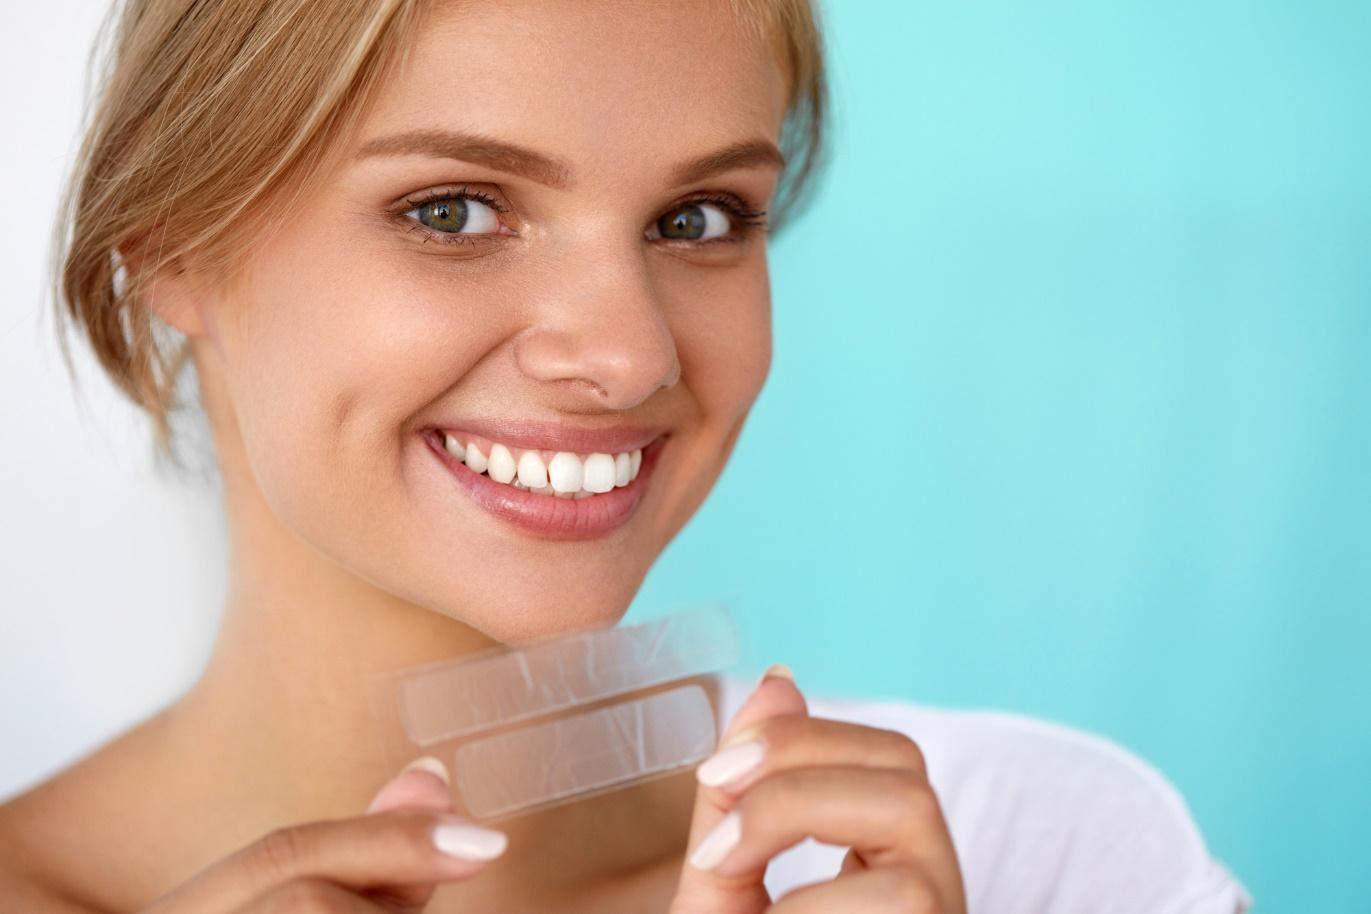 Six Secrets to Perfectly White Teeth